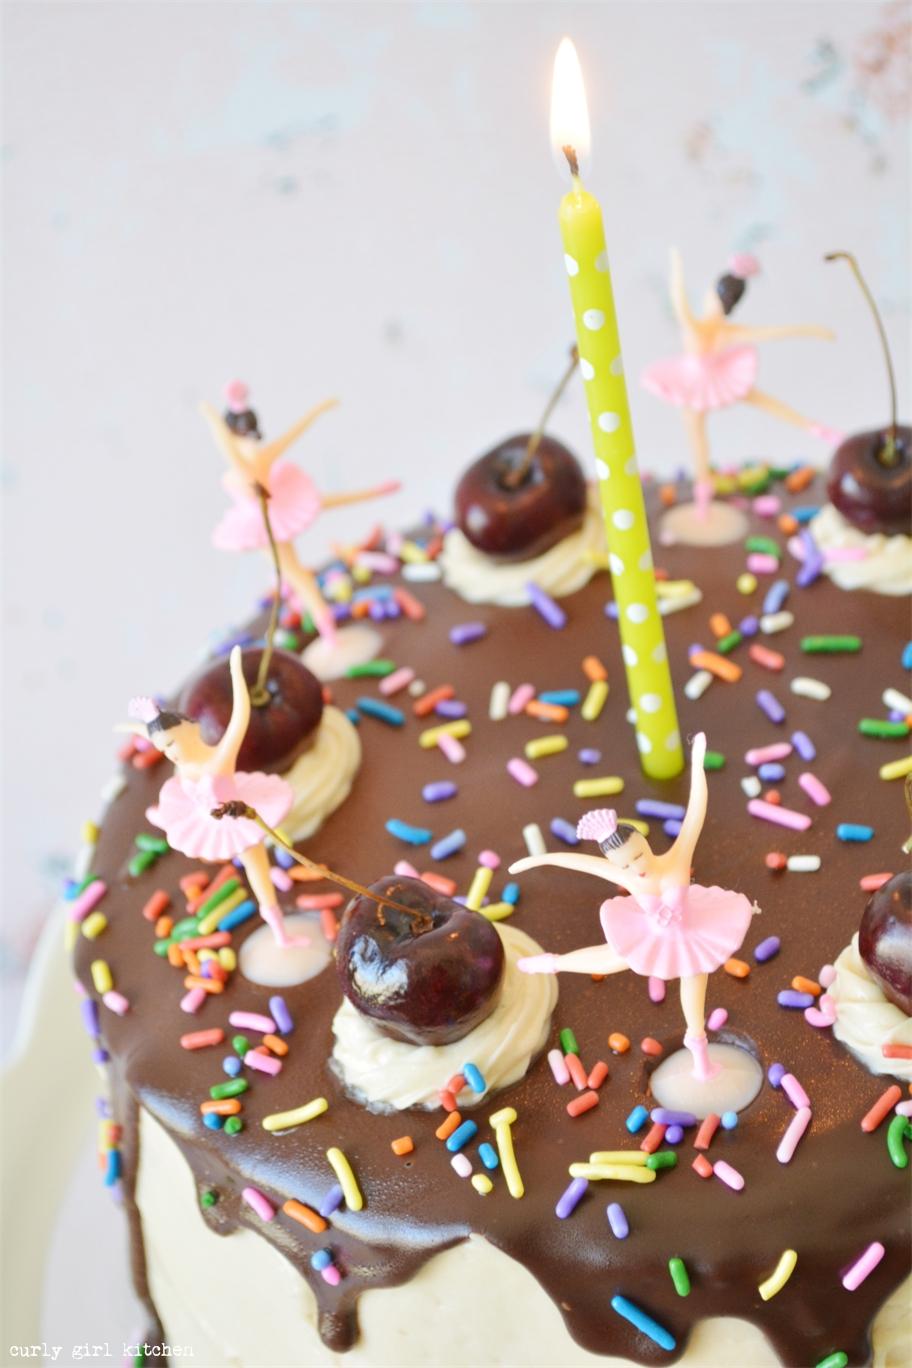 Curly Girl Kitchen Banana Split Birthday Cake With Dancing Ballerinas